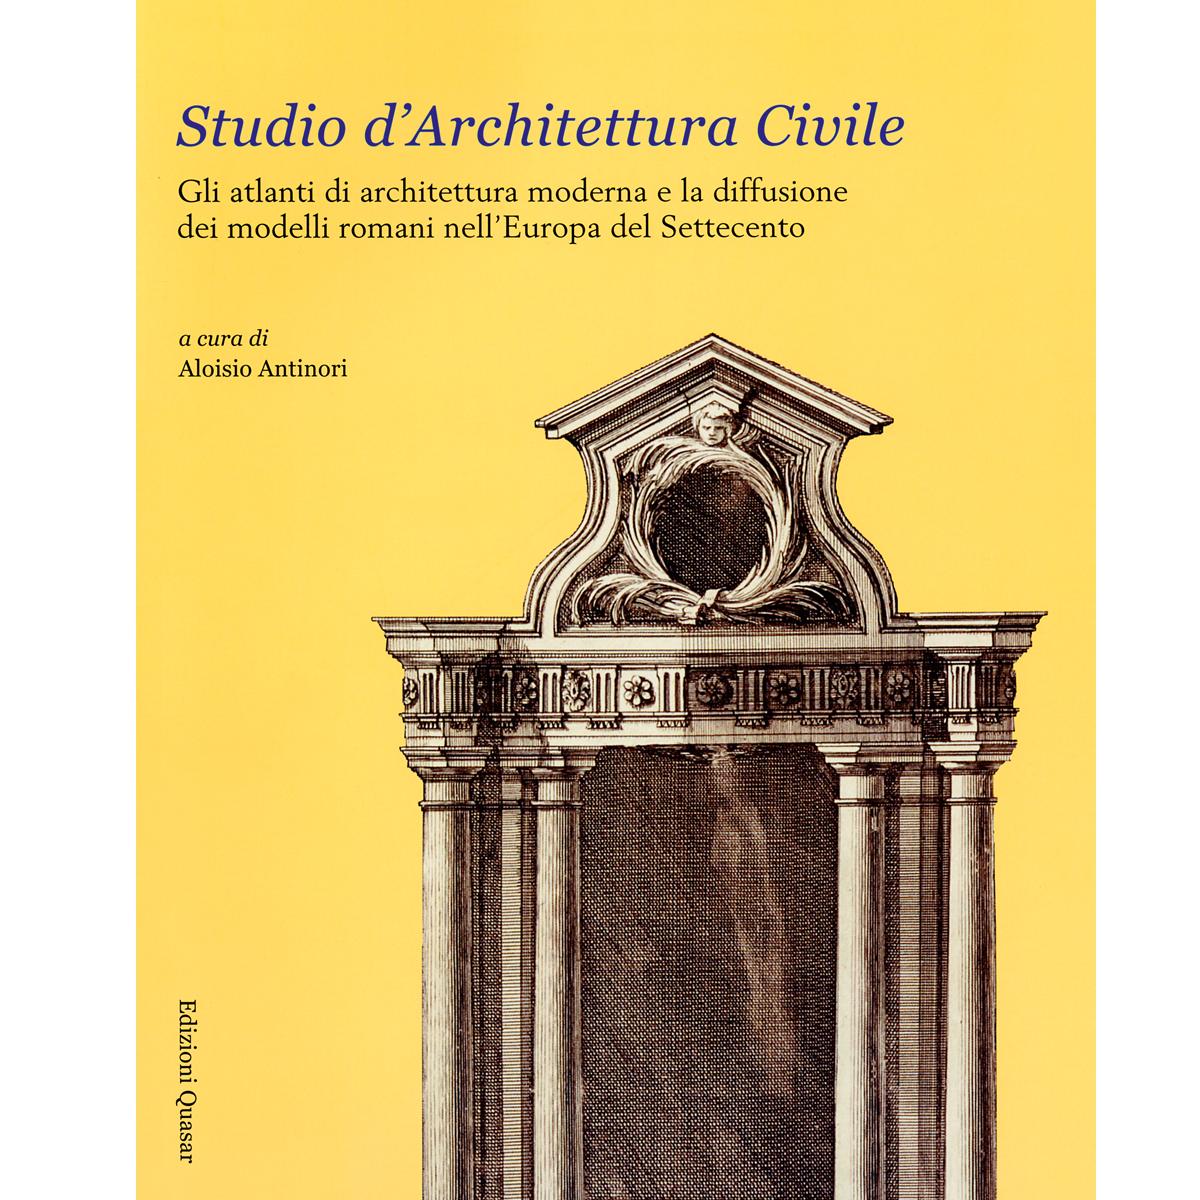 Studio d'Architettura Civile